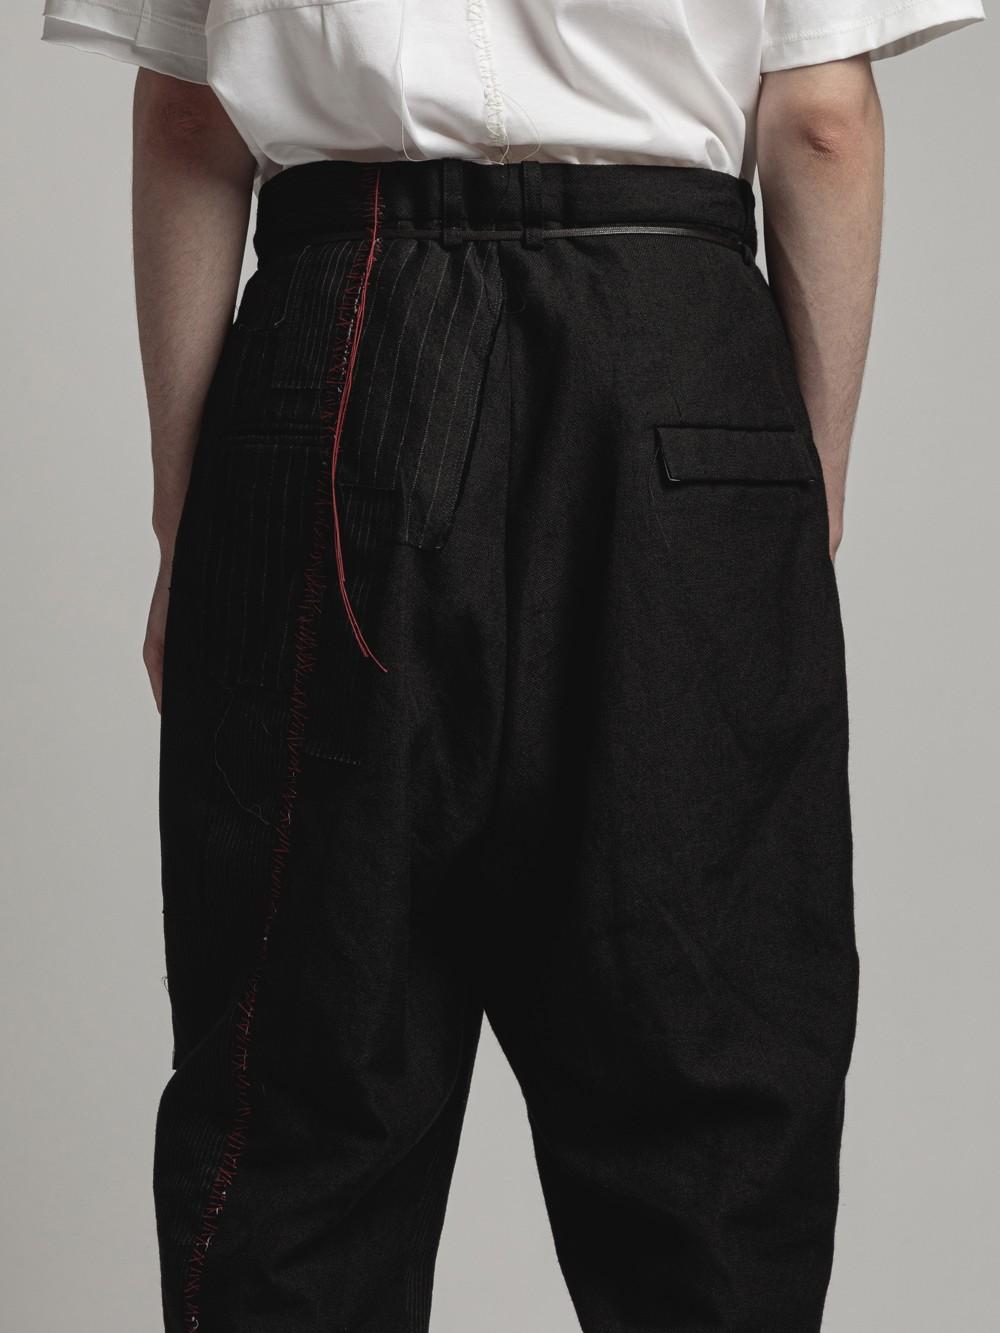 patched jogger pants